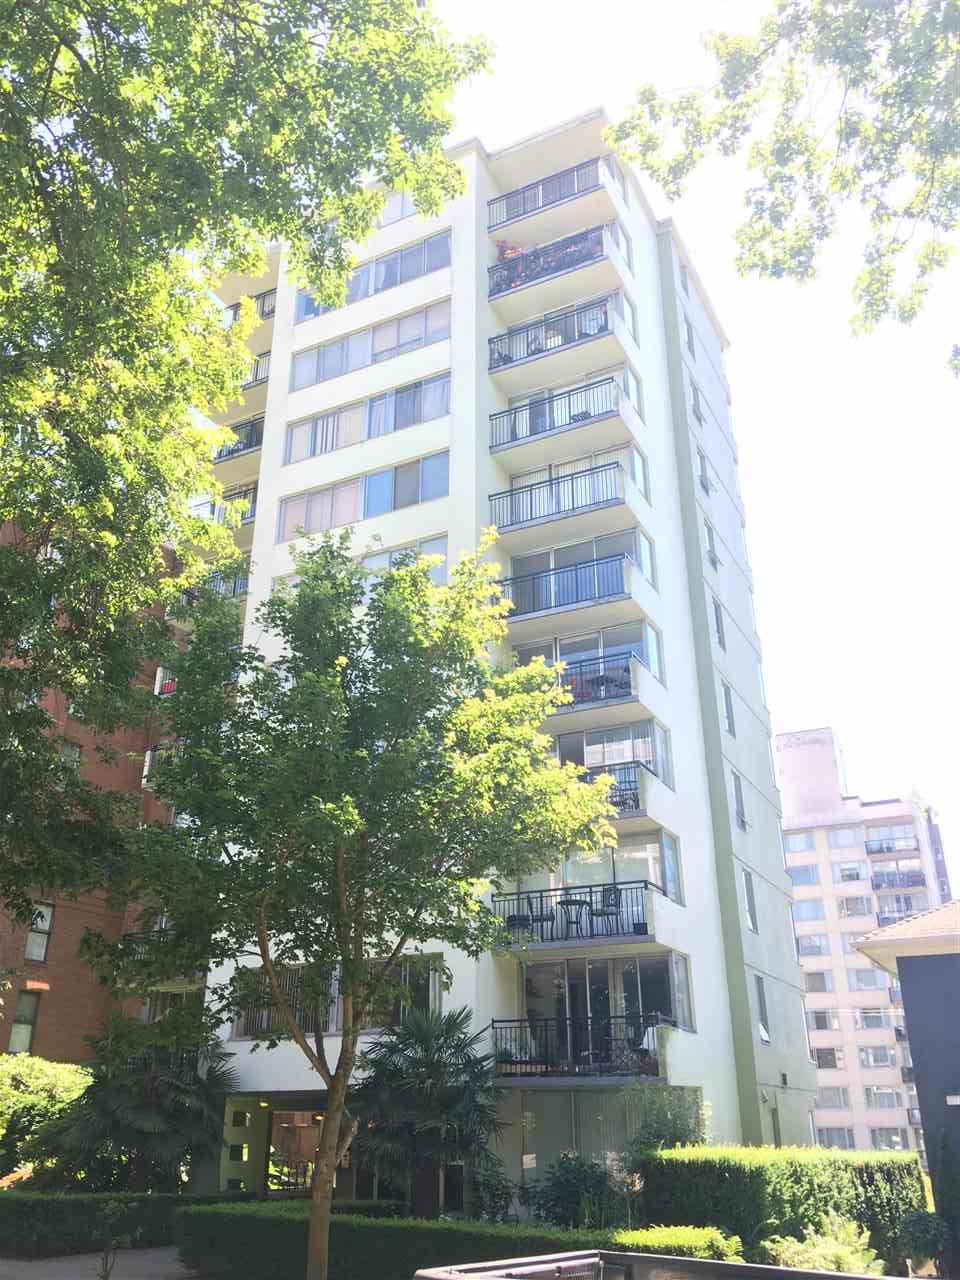 Condo Apartment at 702 1534 HARWOOD STREET, Unit 702, Vancouver West, British Columbia. Image 1